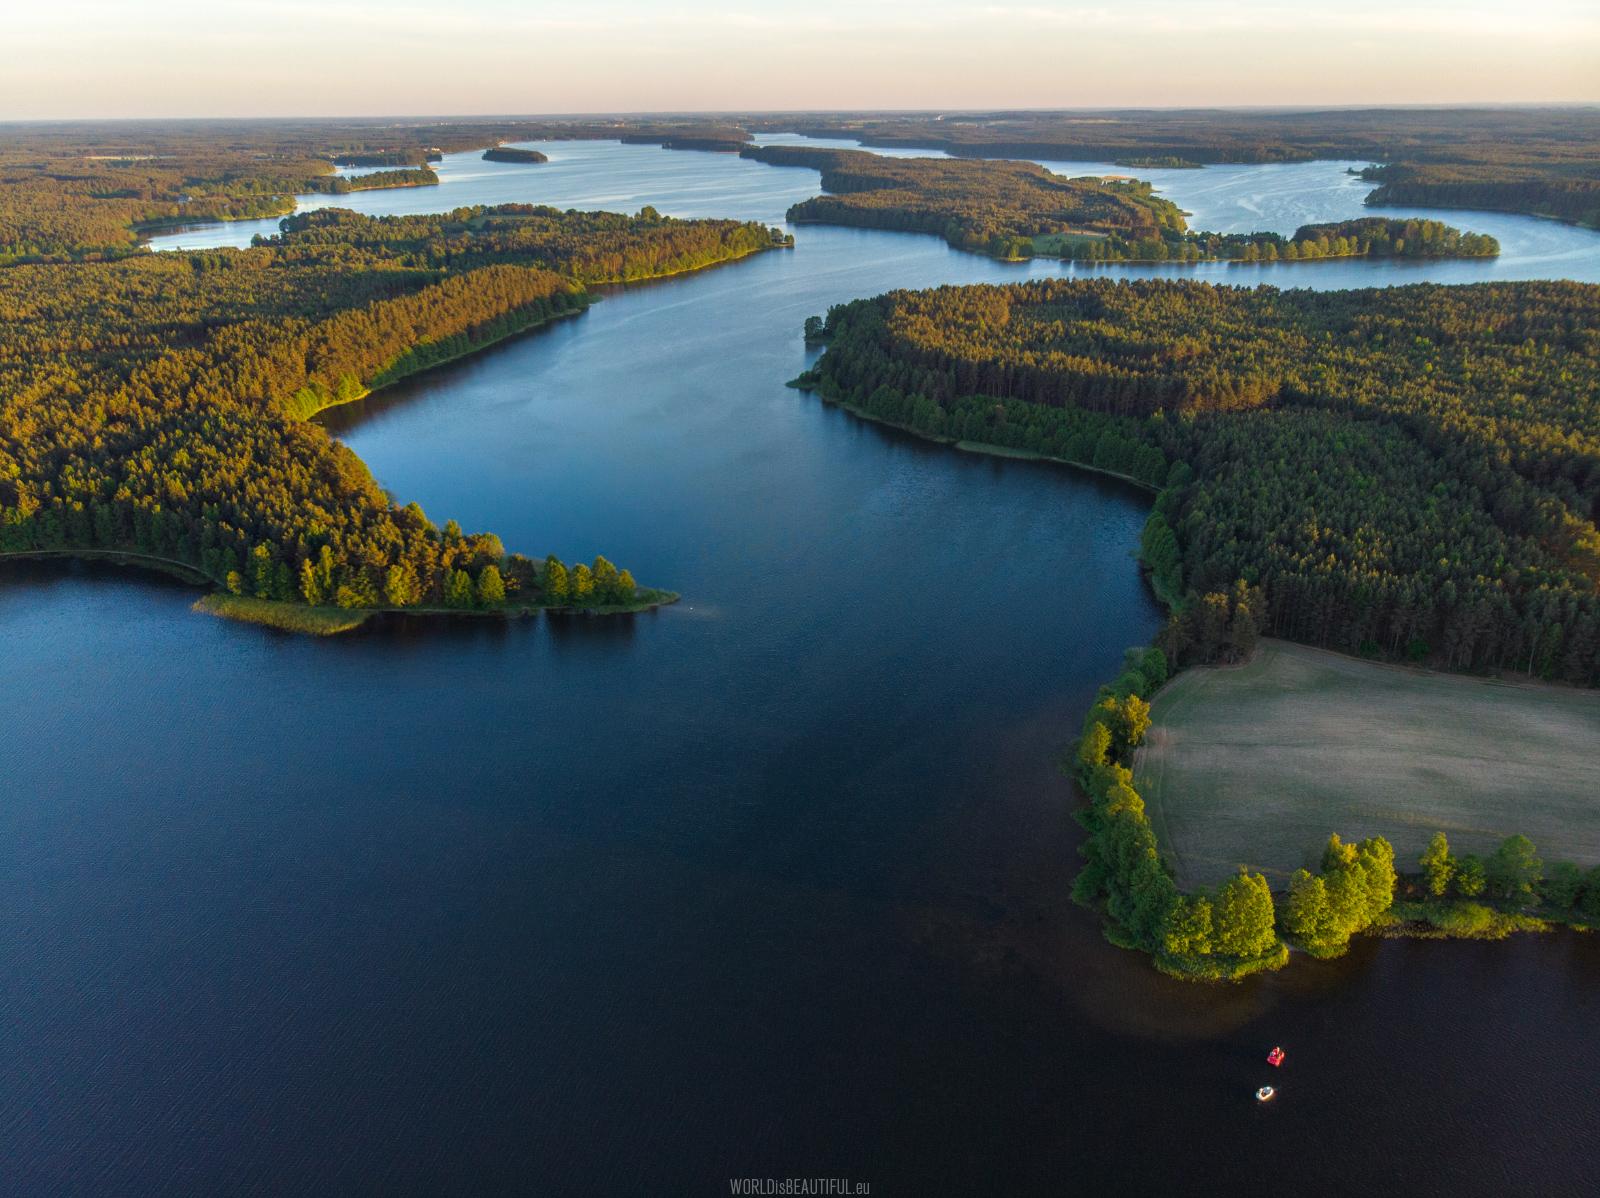 Wdzydze Lake, Poland